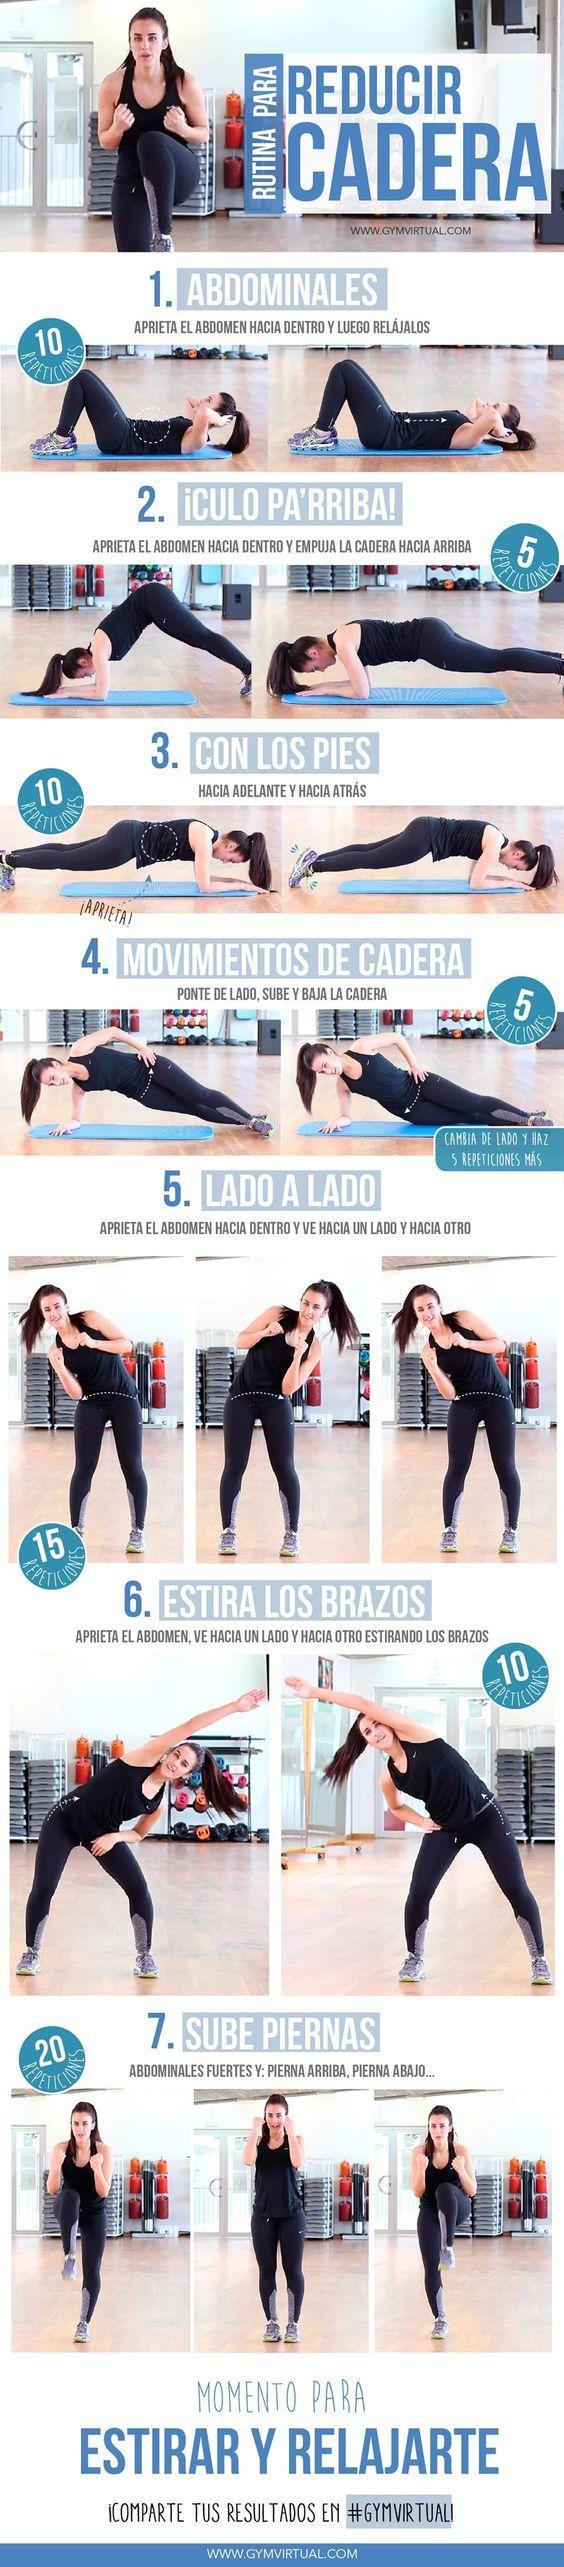 Rutina para Reducir Cadera - Hips